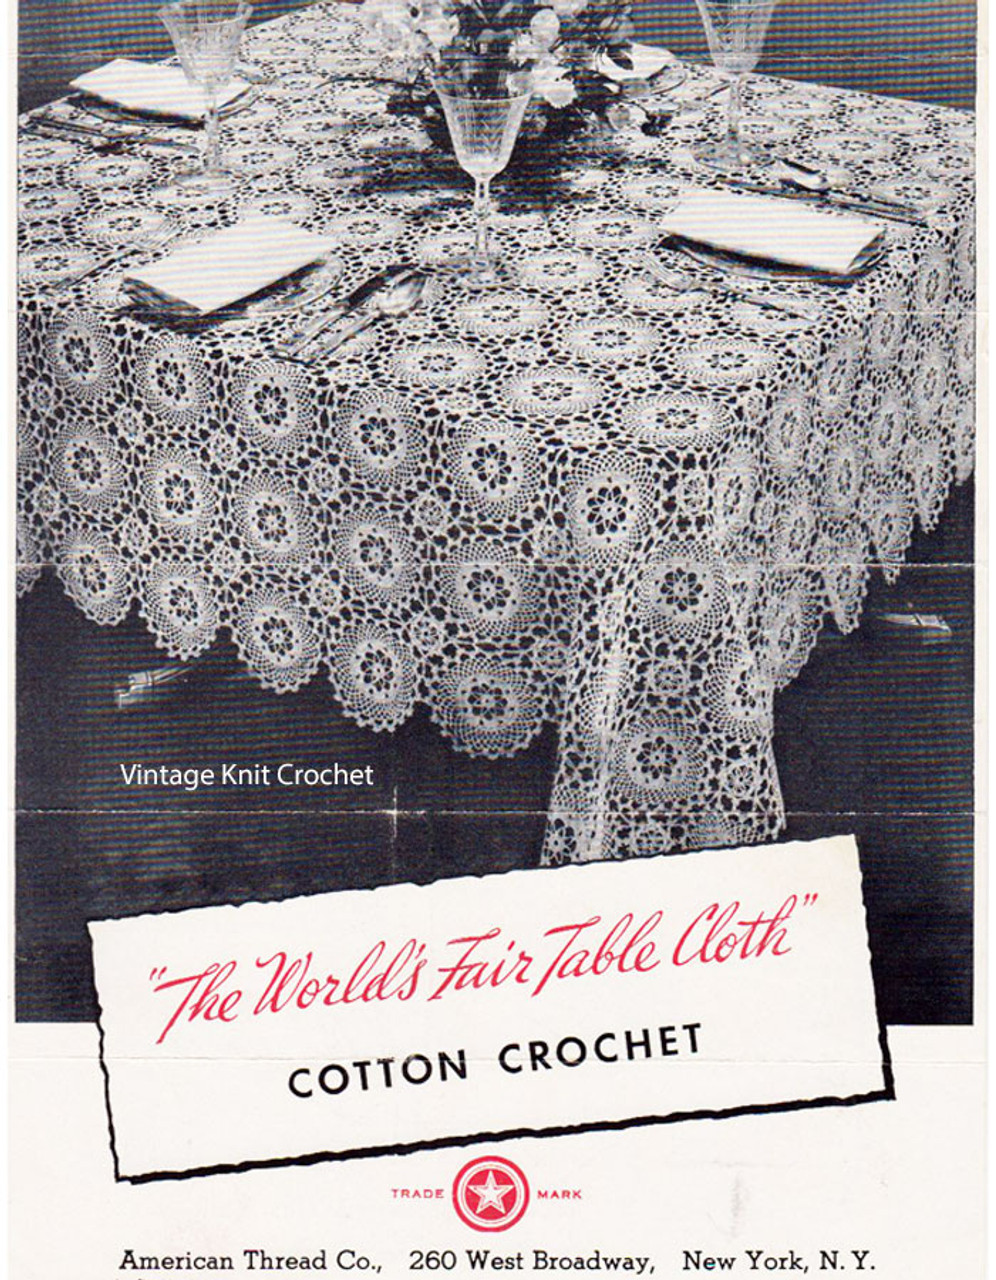 Round Medallion Crochet Tablecloth Pattern, Worlds Fair